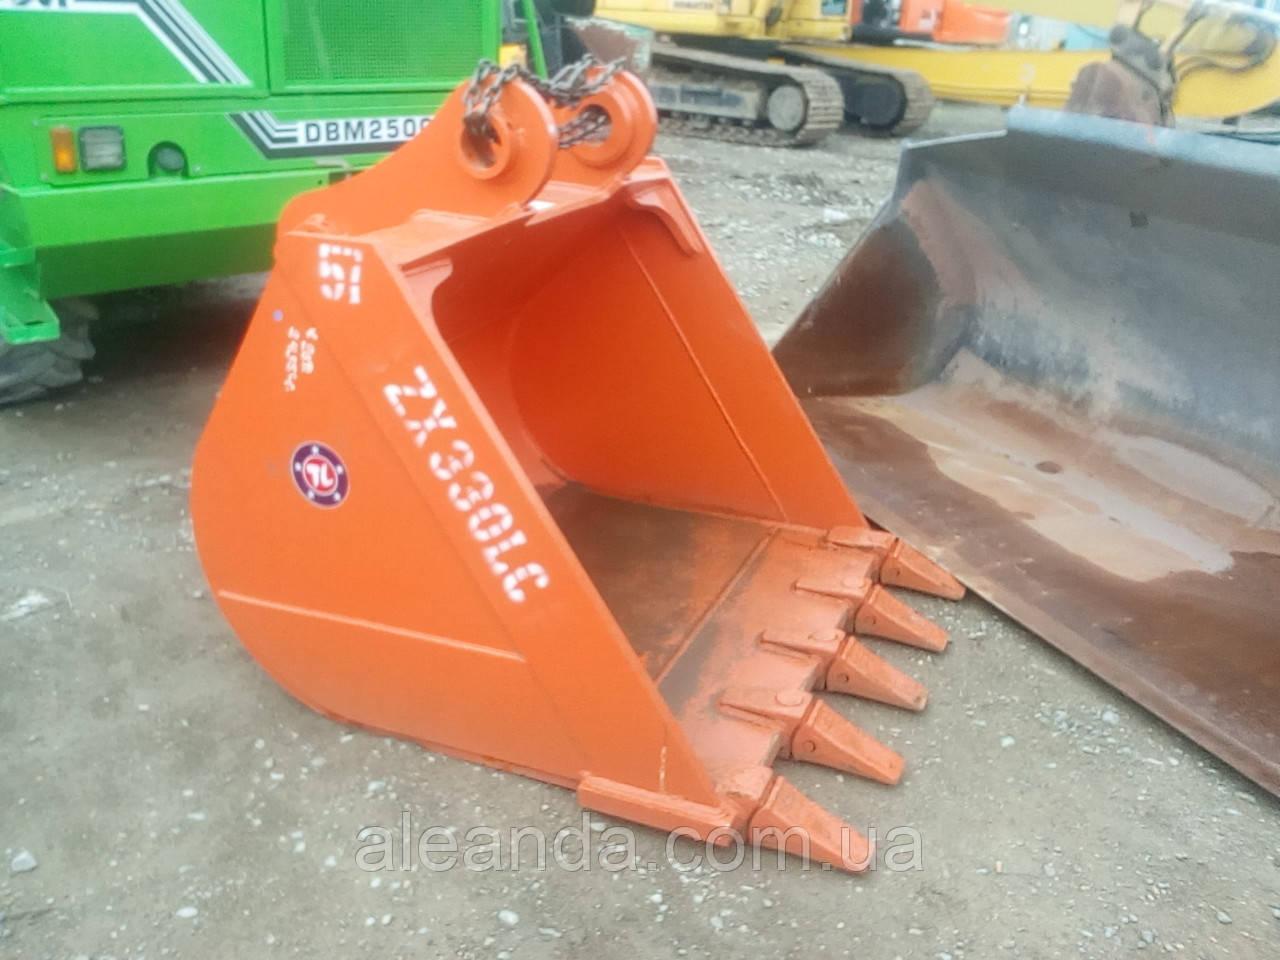 Ковш экскаватора CATERPILLAR zx 330 lc